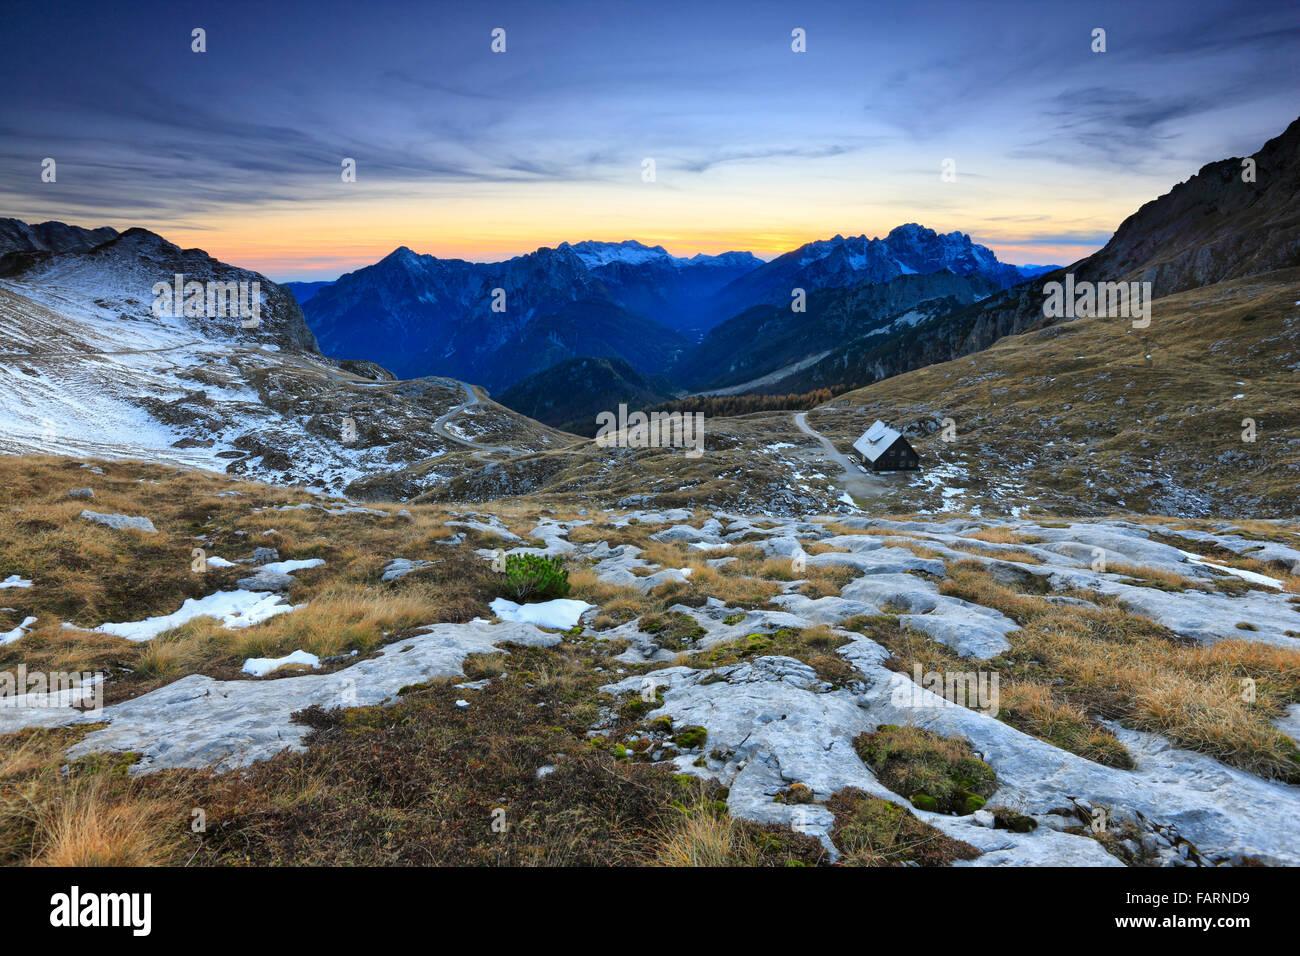 Las montañas del atardecer paisaje.Alpes Julianos de Eslovenia e Italia. Imagen De Stock